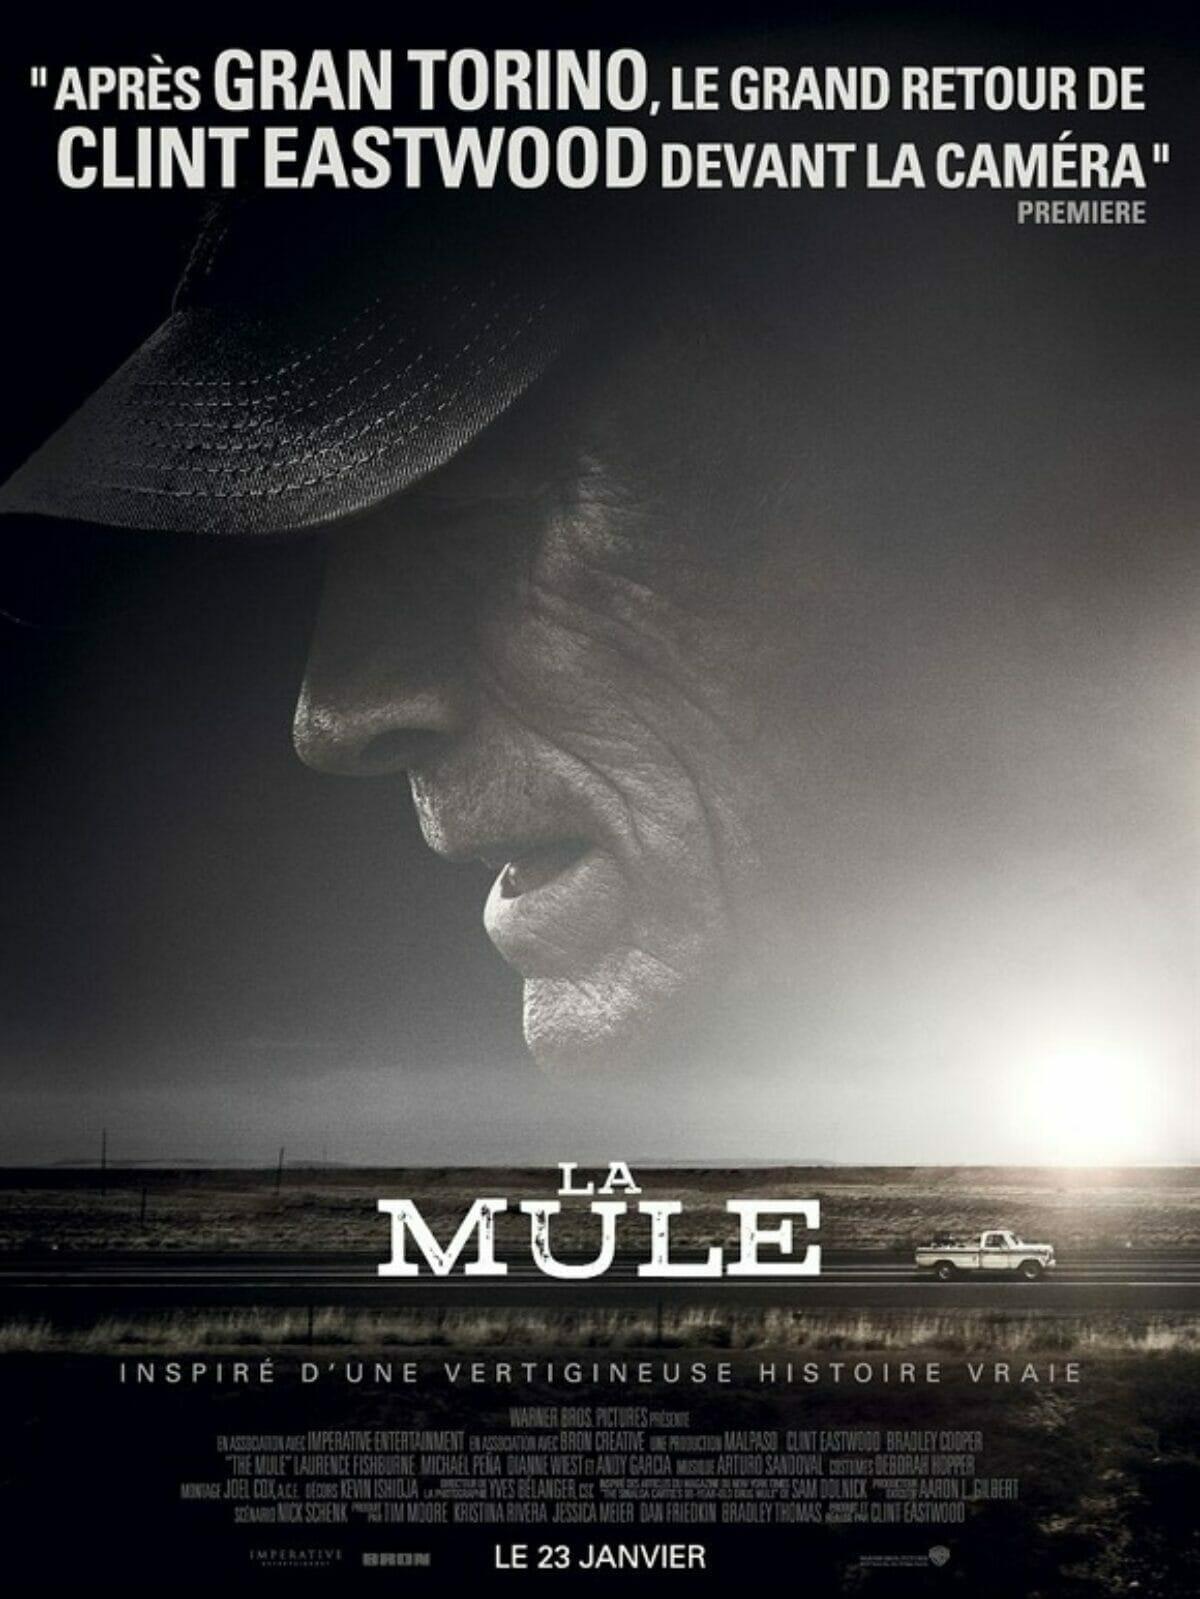 La-Mule-poster